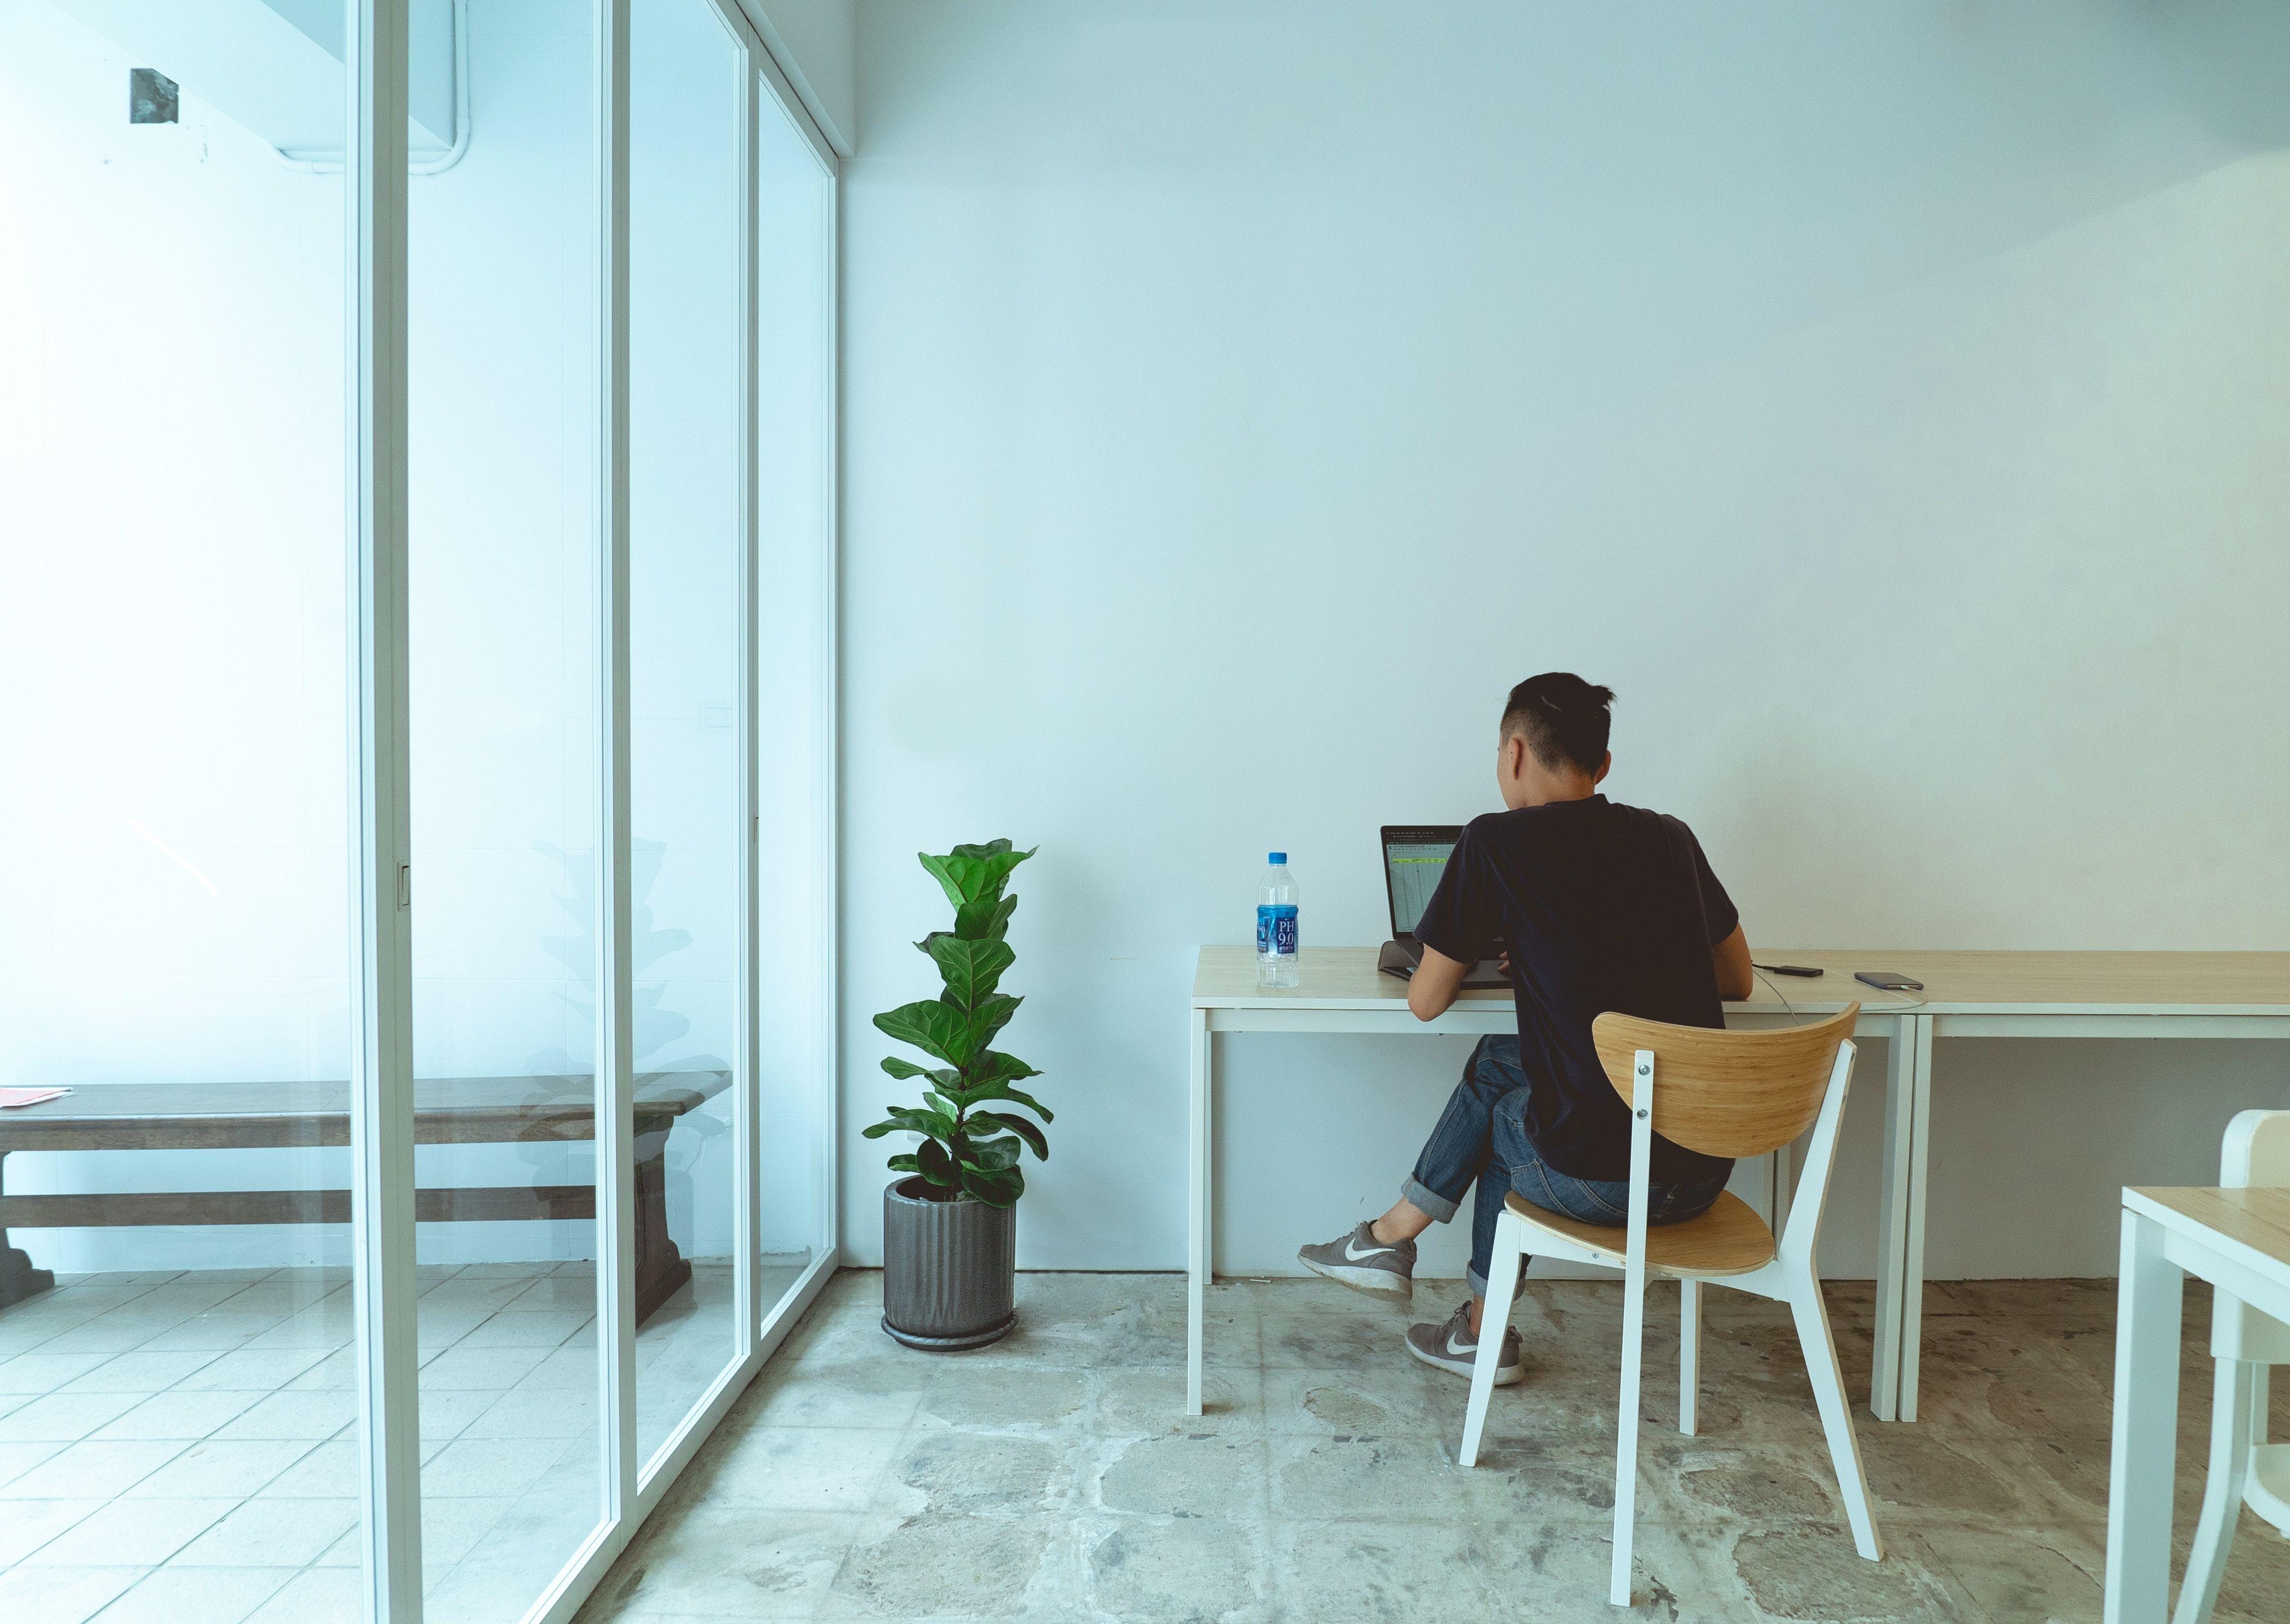 Man on a desk